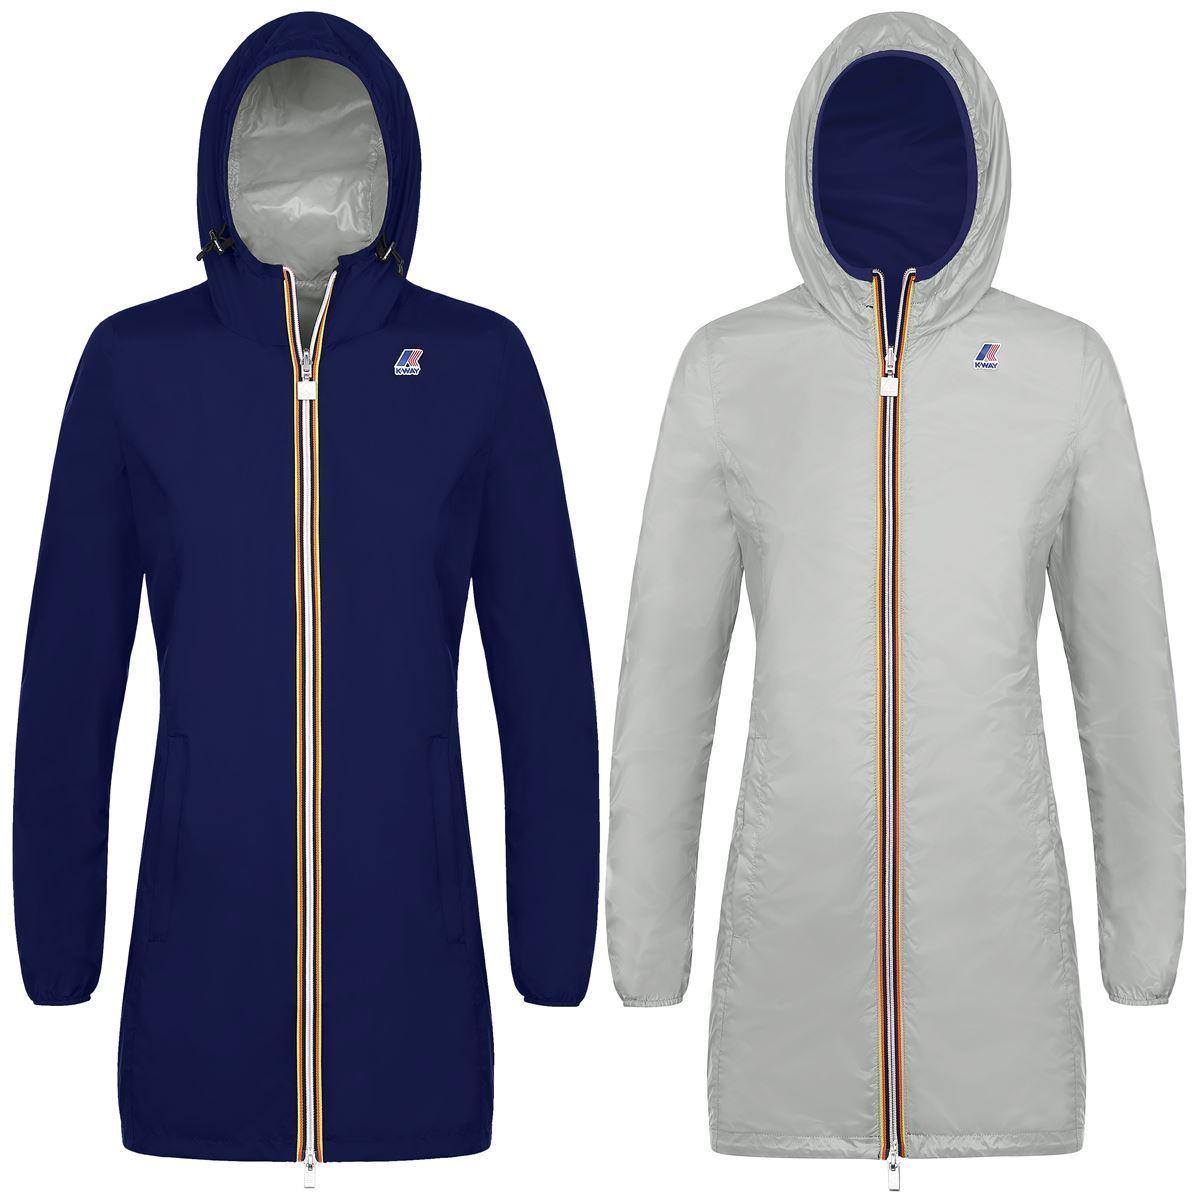 a basso prezzo 8ff7e 95df7 Reversible Jacket 3/4 Women K-way Article k003ez0 Mod. Virginie ...